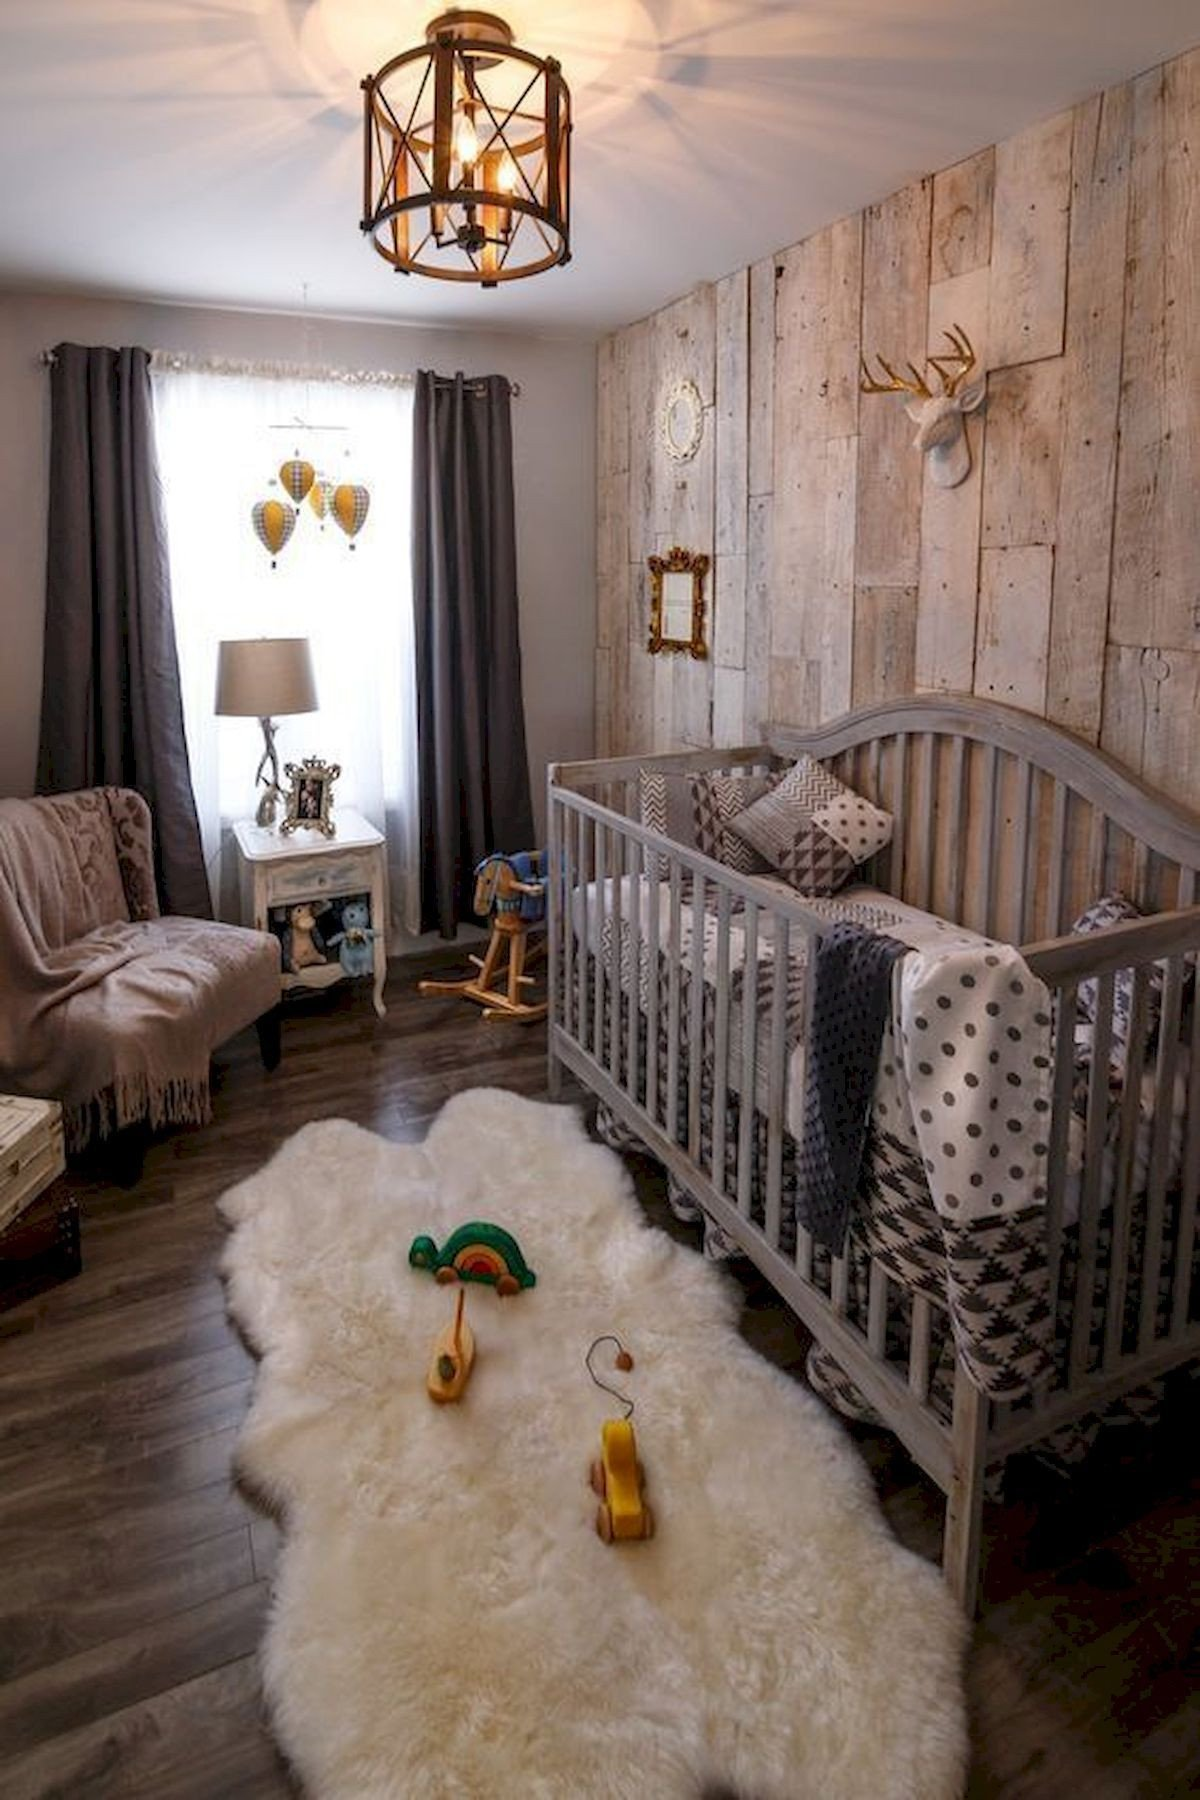 Boy Baby Bedroom Ideas Elegant 30 Adorable Rustic Nursery Room Ideas Room Ideas